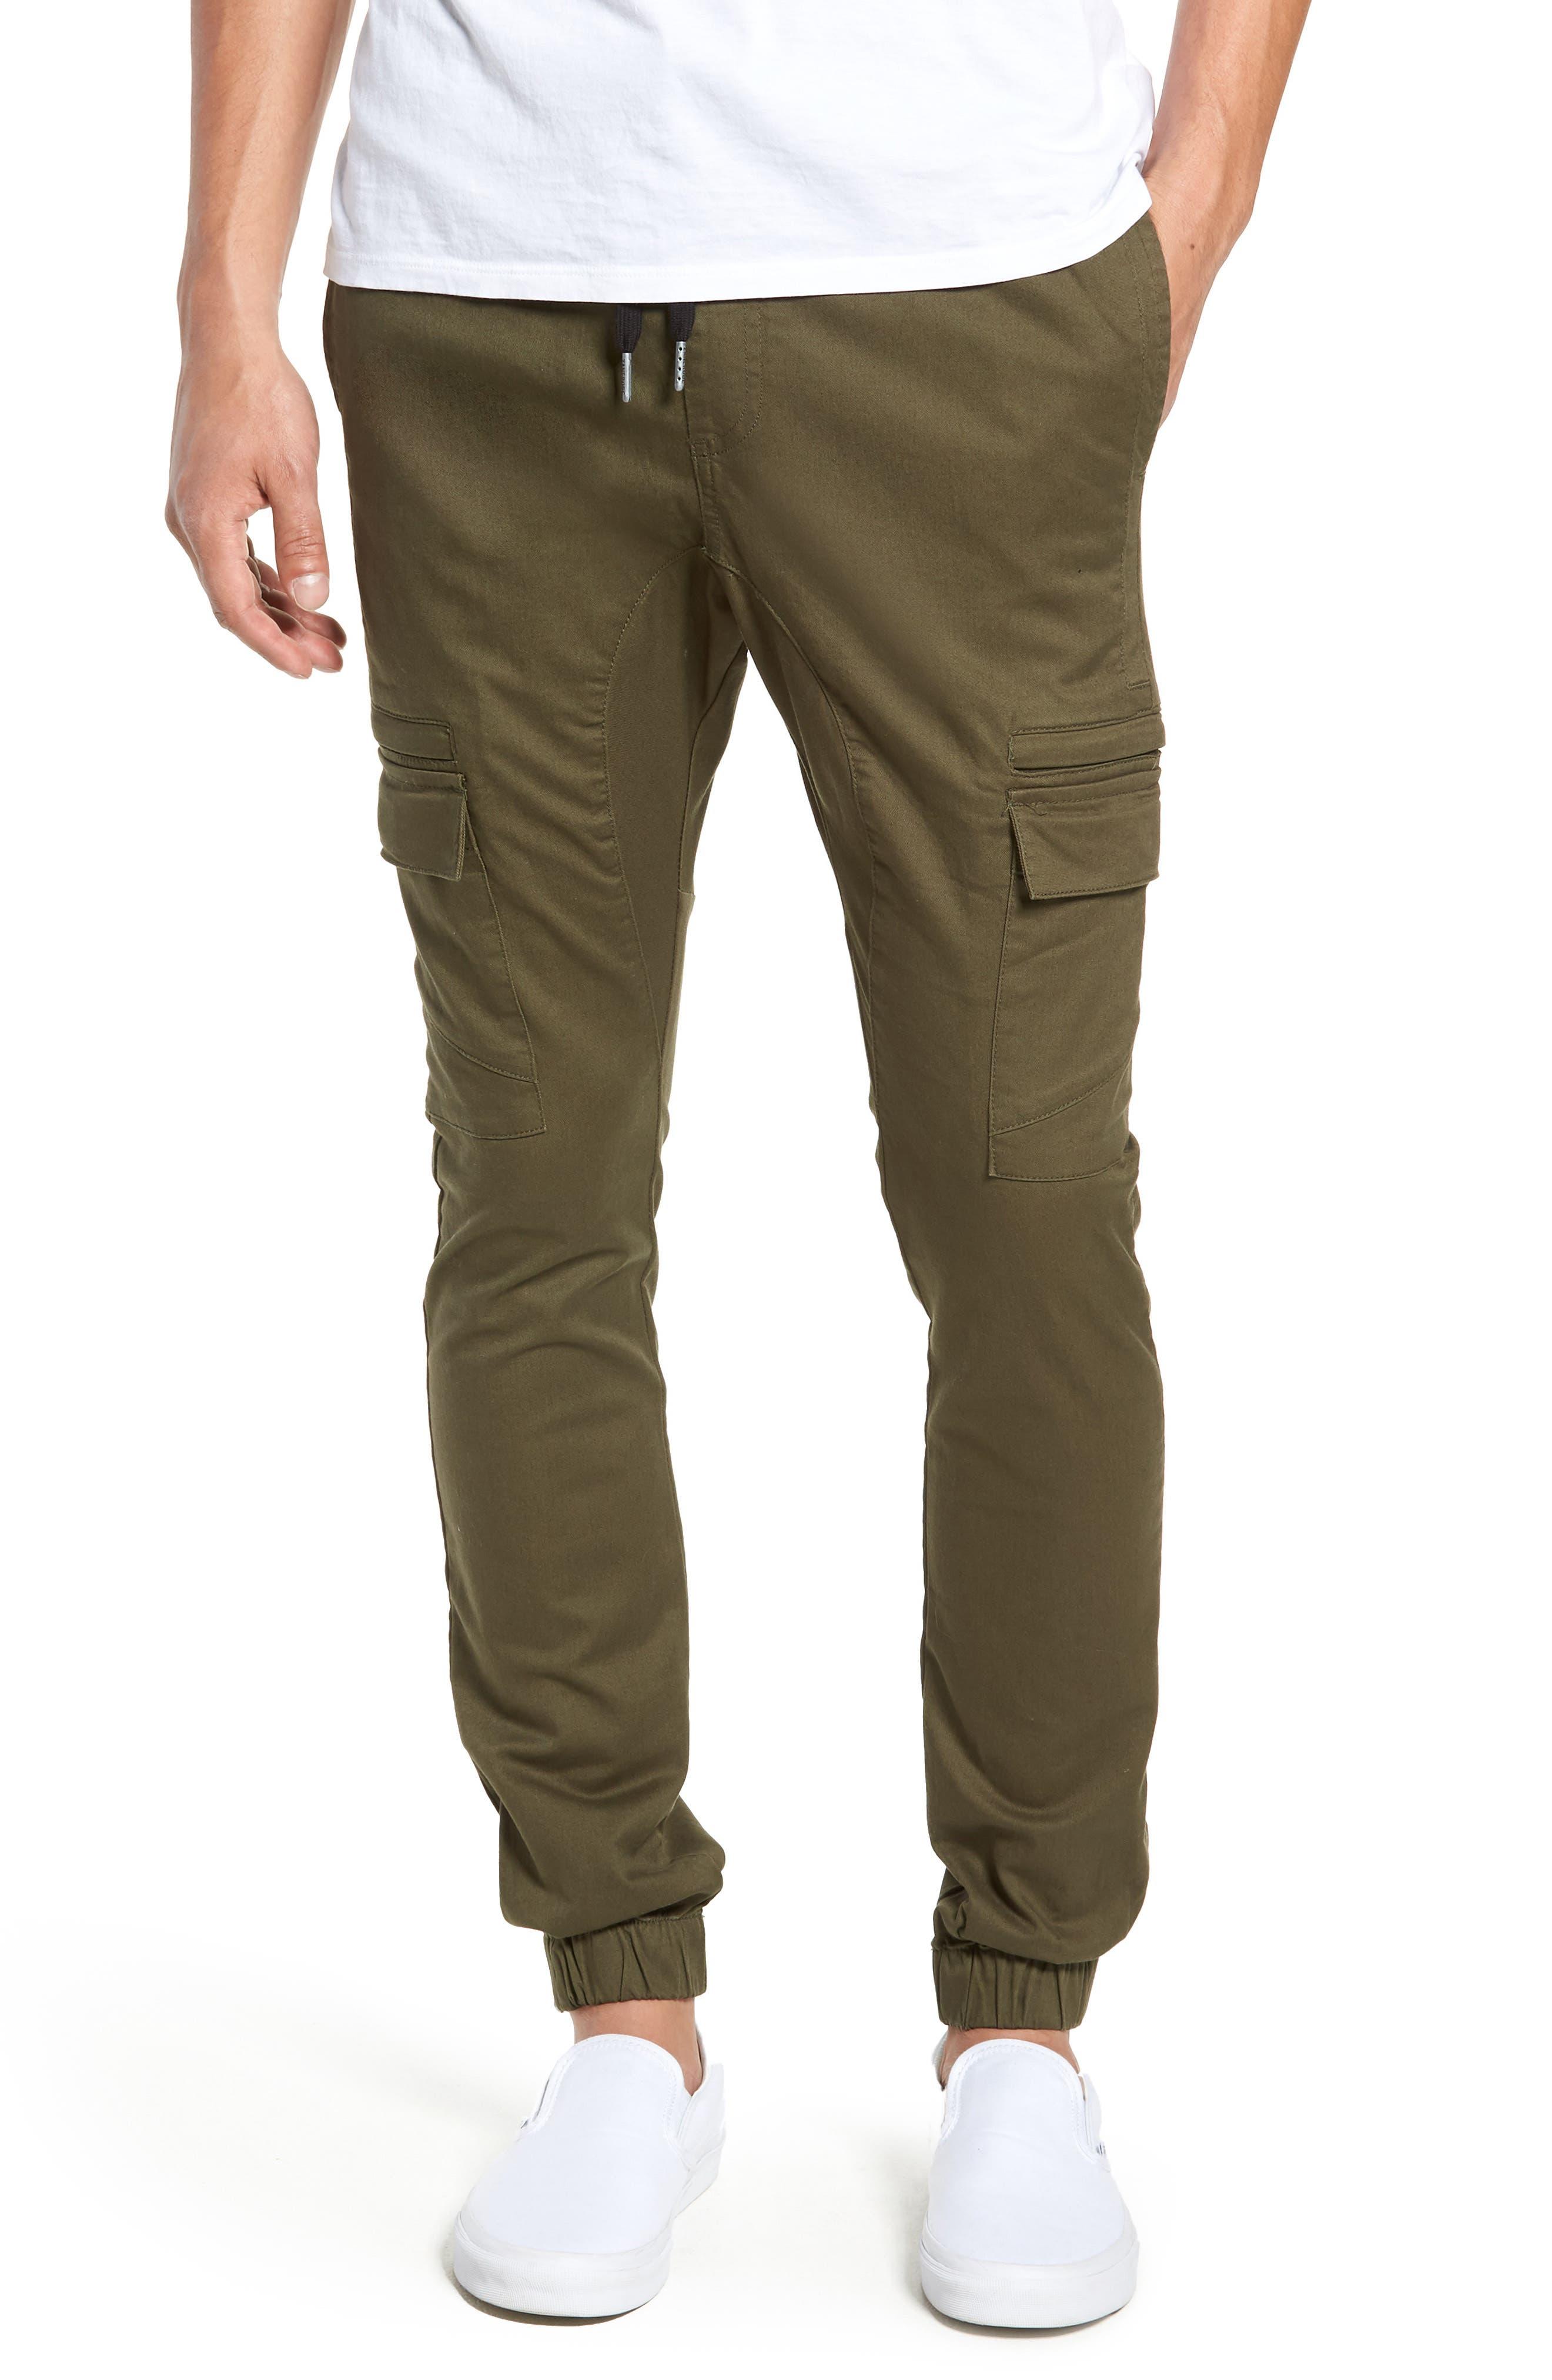 Sureshot Cargo Jogger Pants,                         Main,                         color, MILITARY